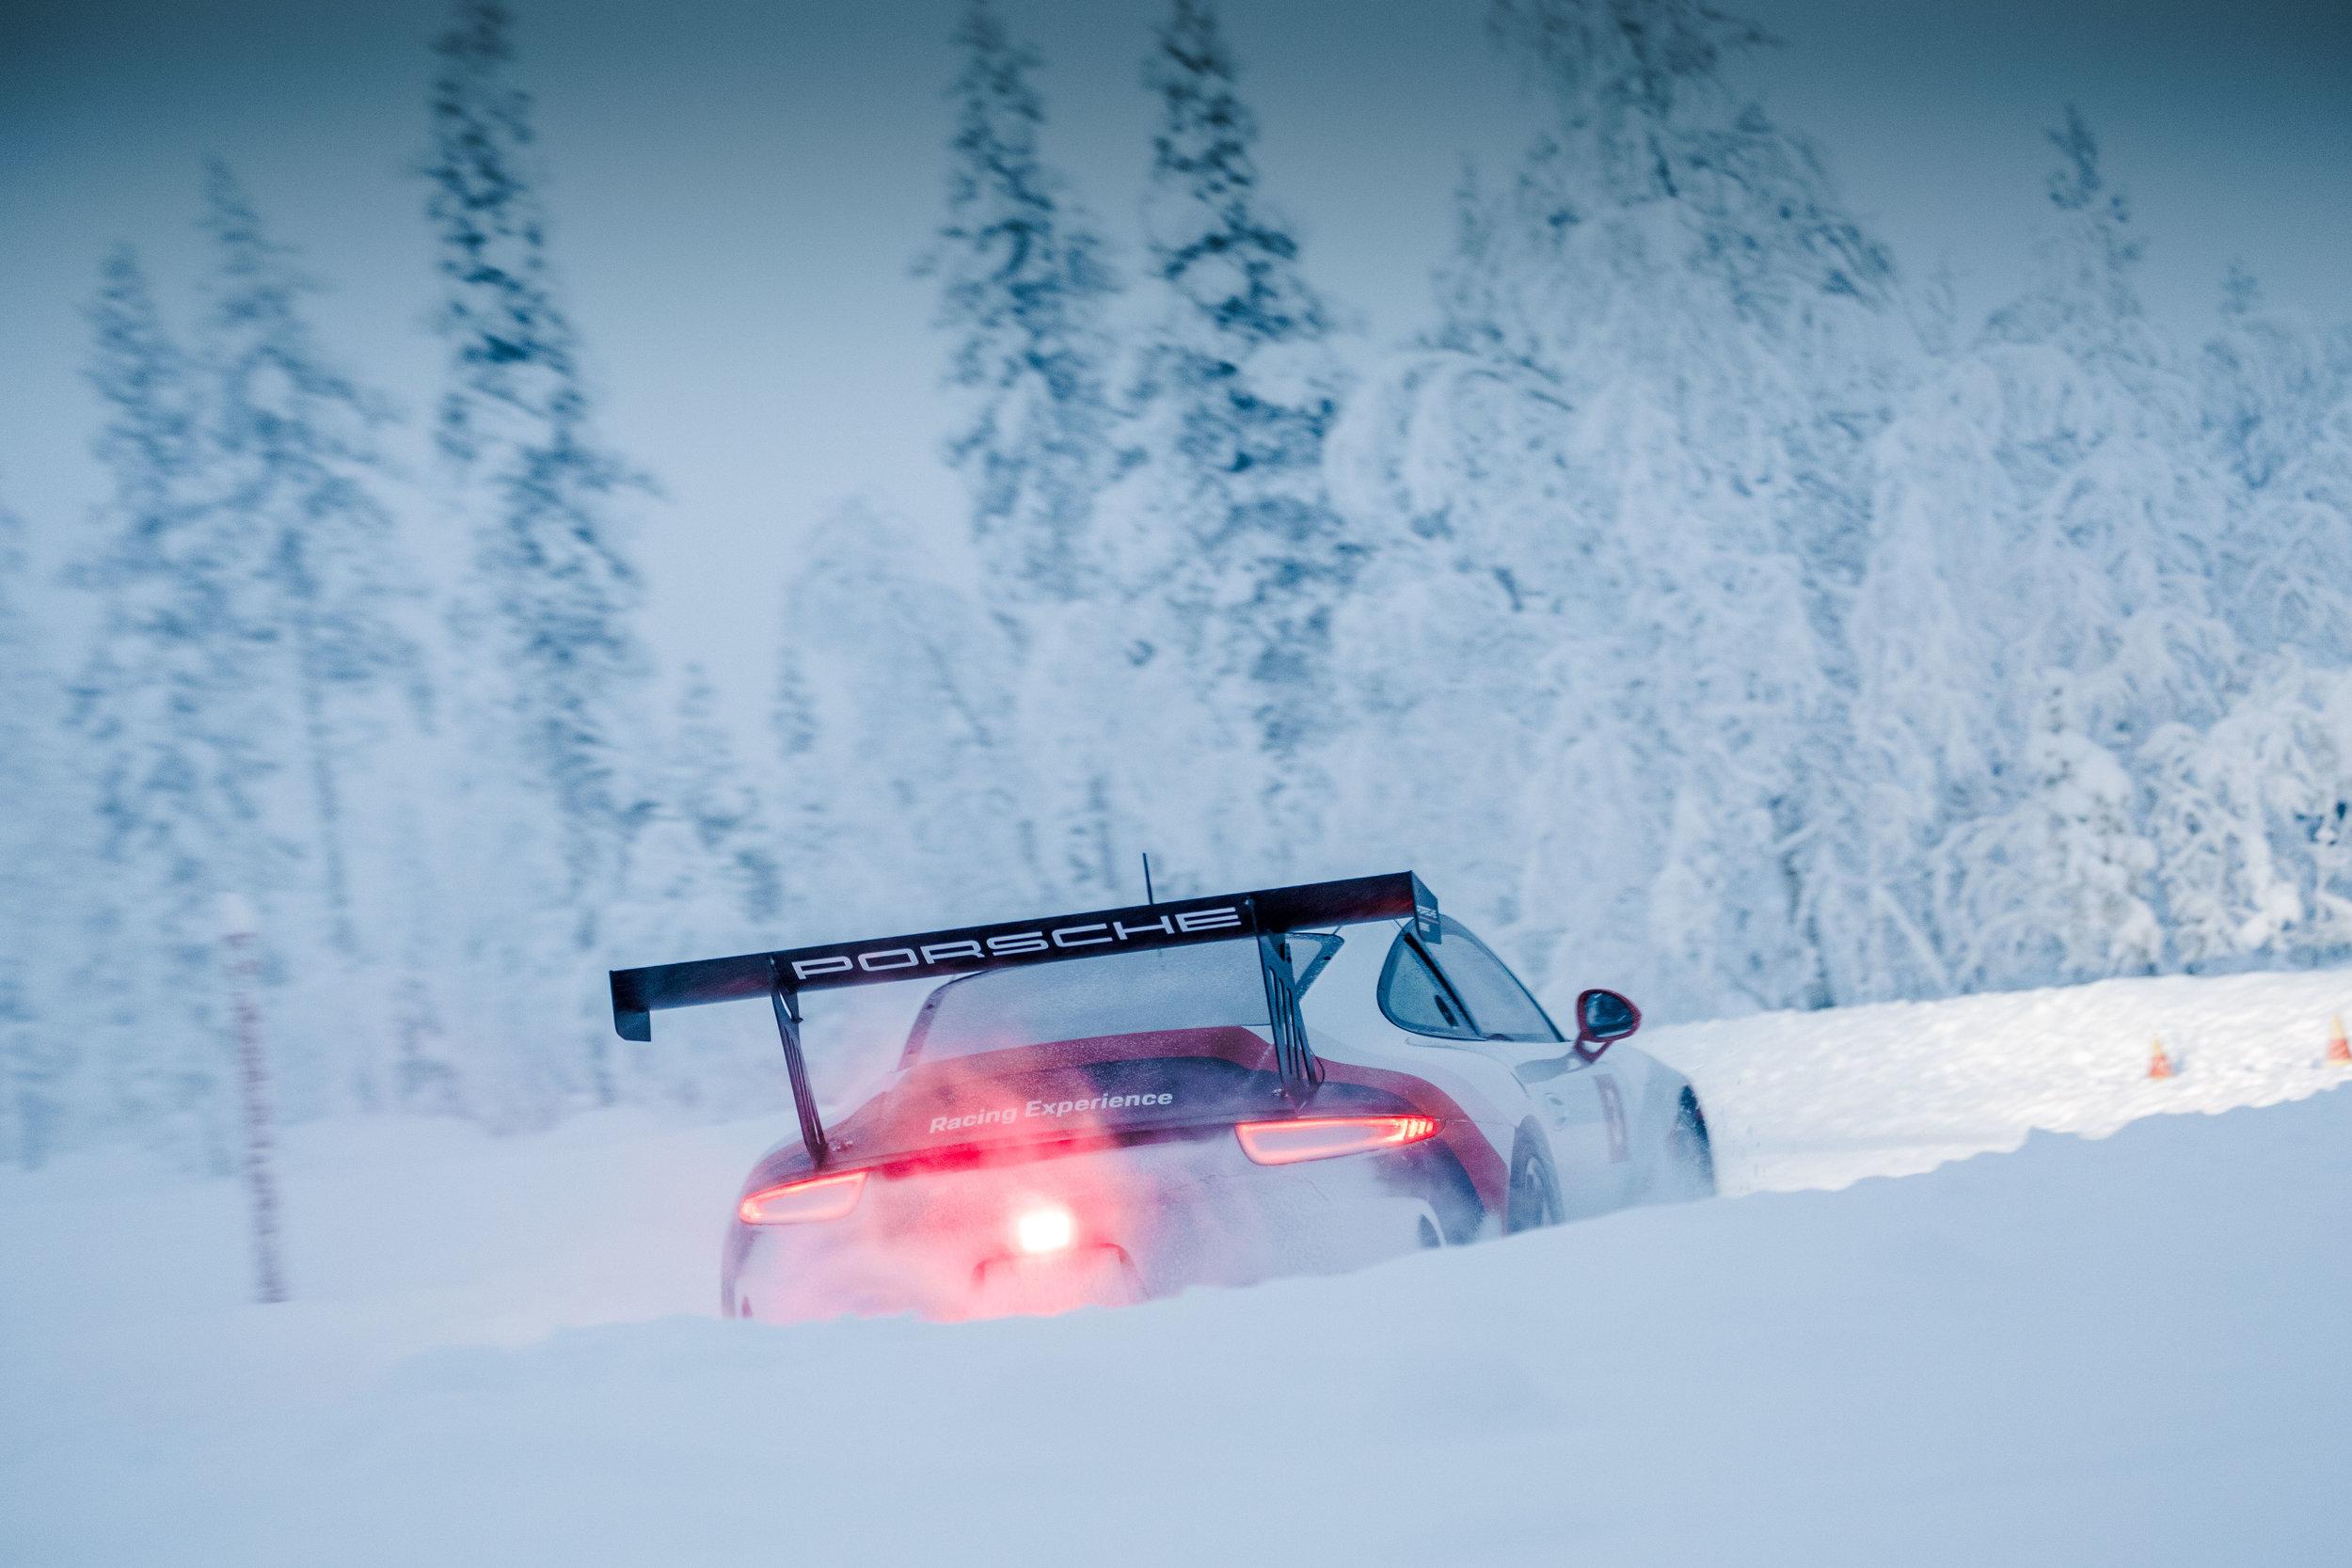 Porsche Ice Experience on Ice_30_01_2019_0232_175643.jpg